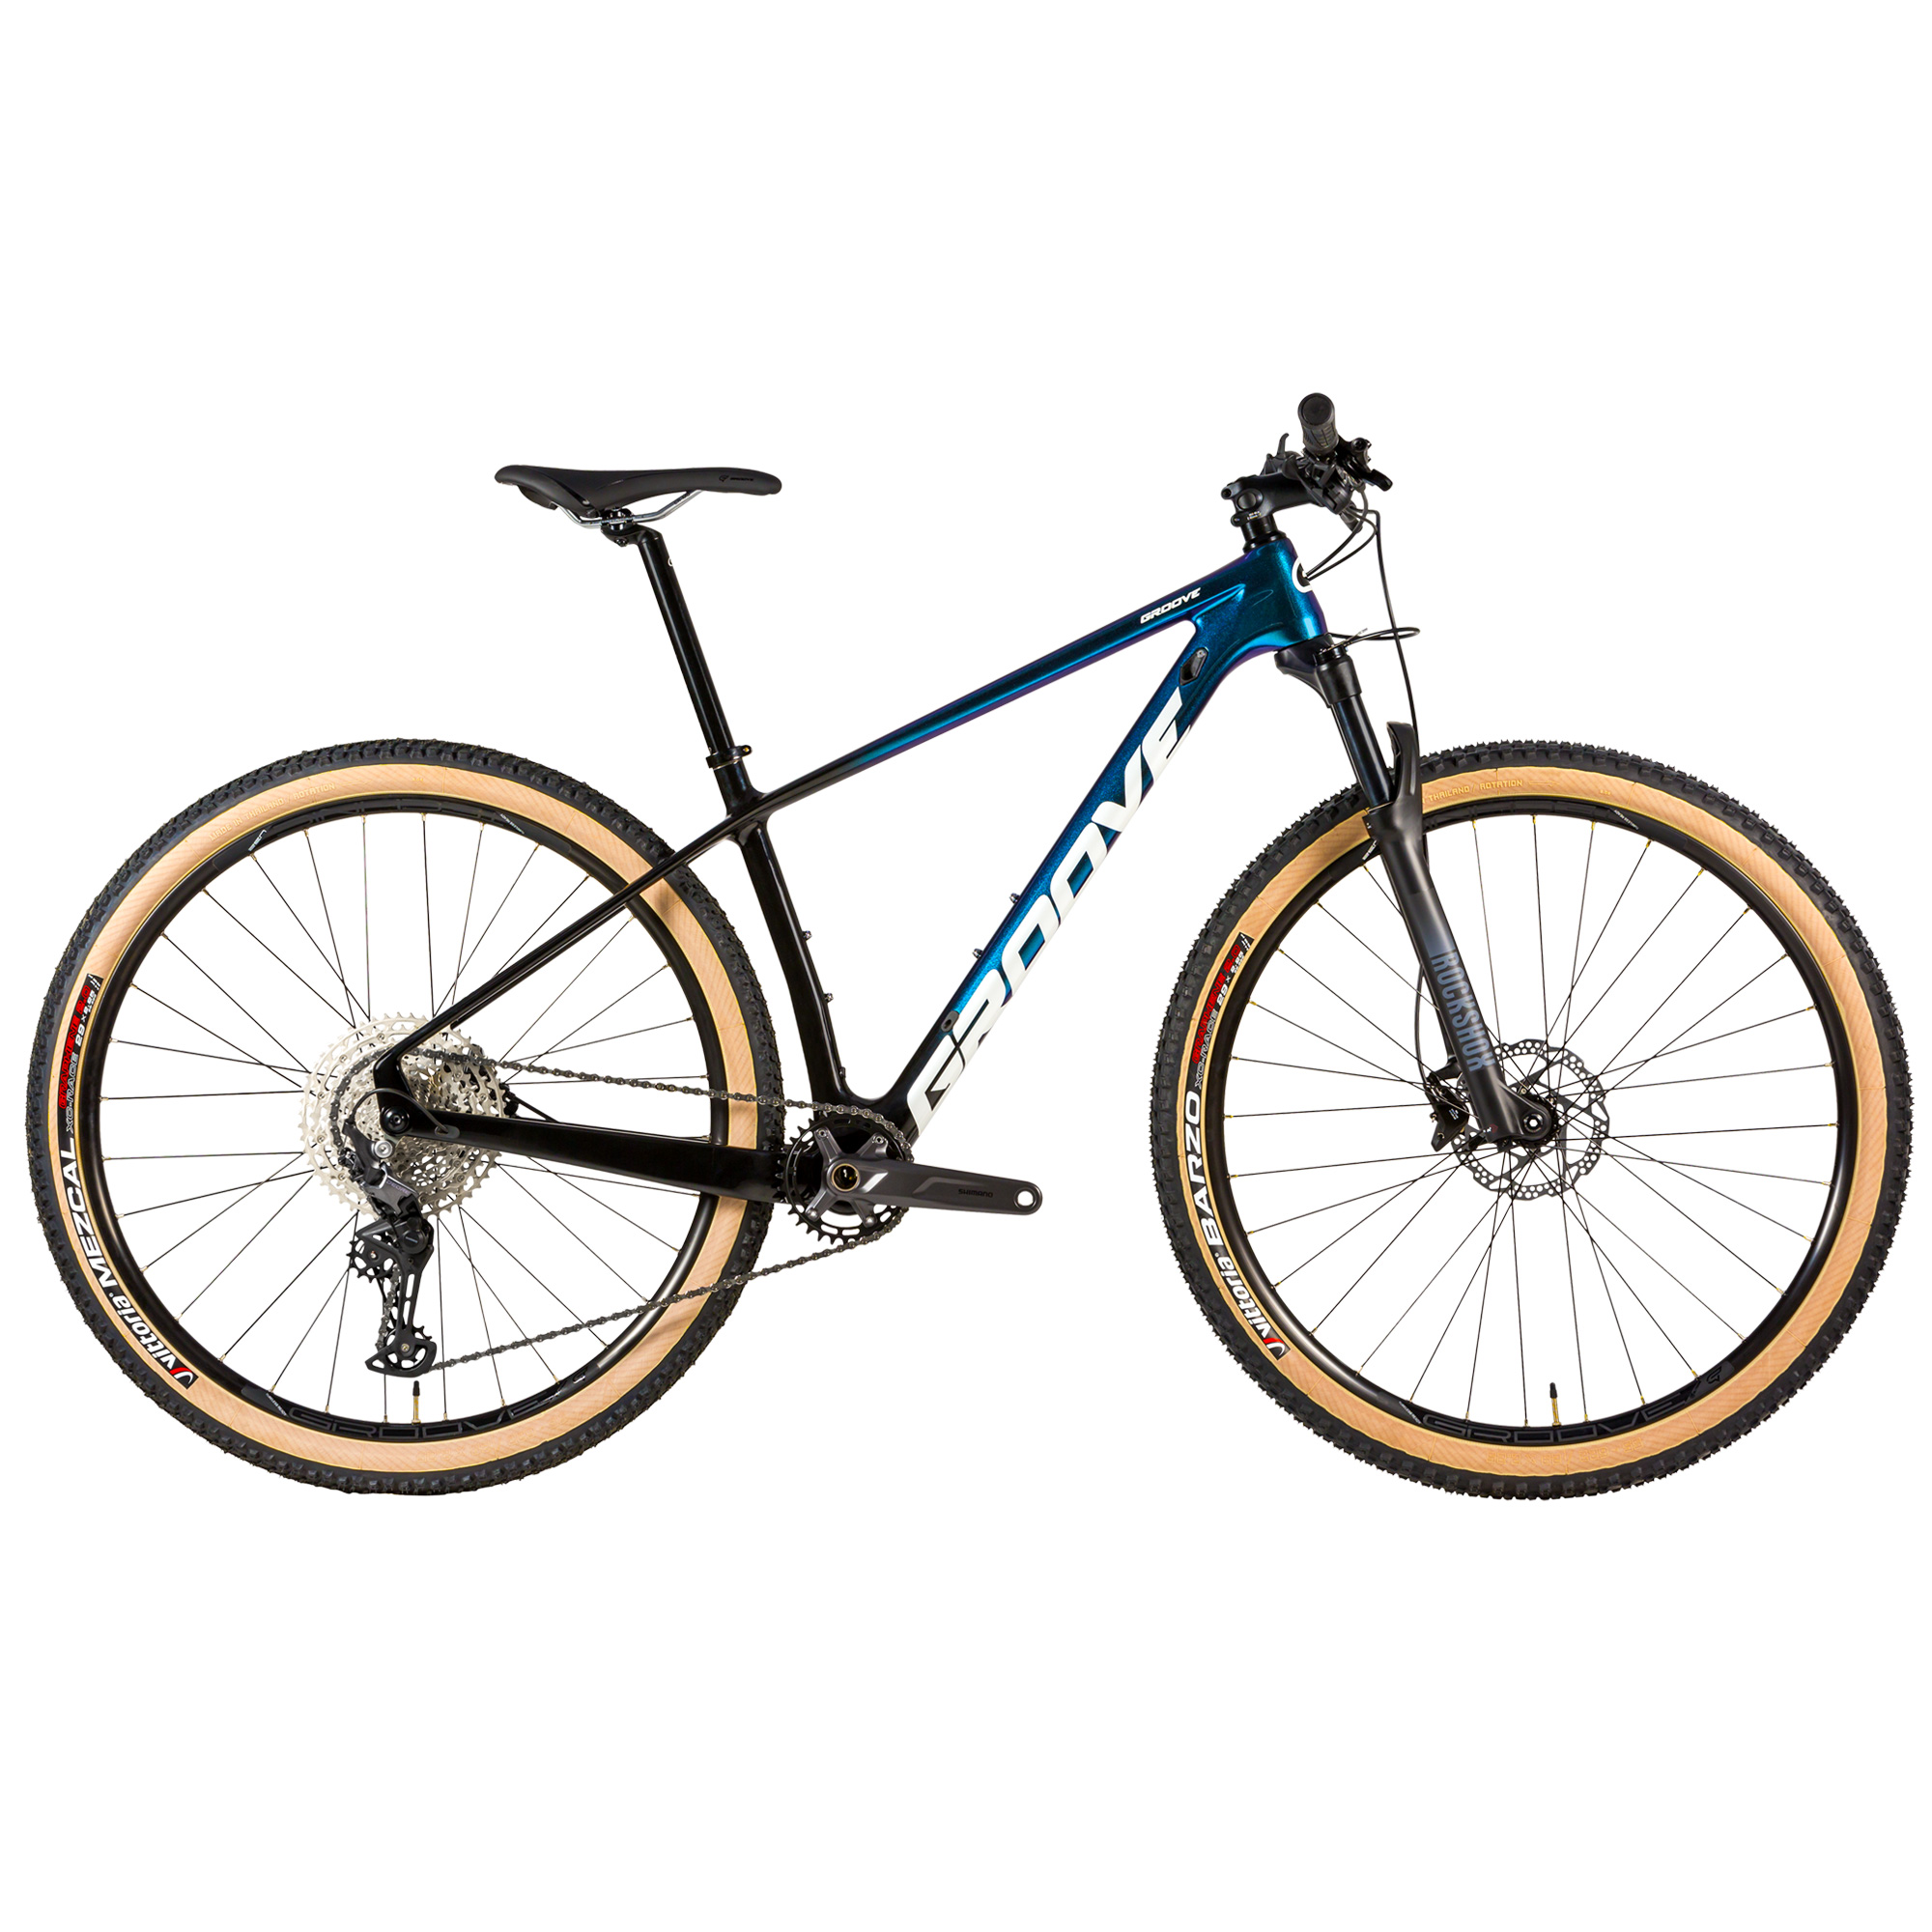 Bicicleta-Groove-Rhythm-7—2022-01